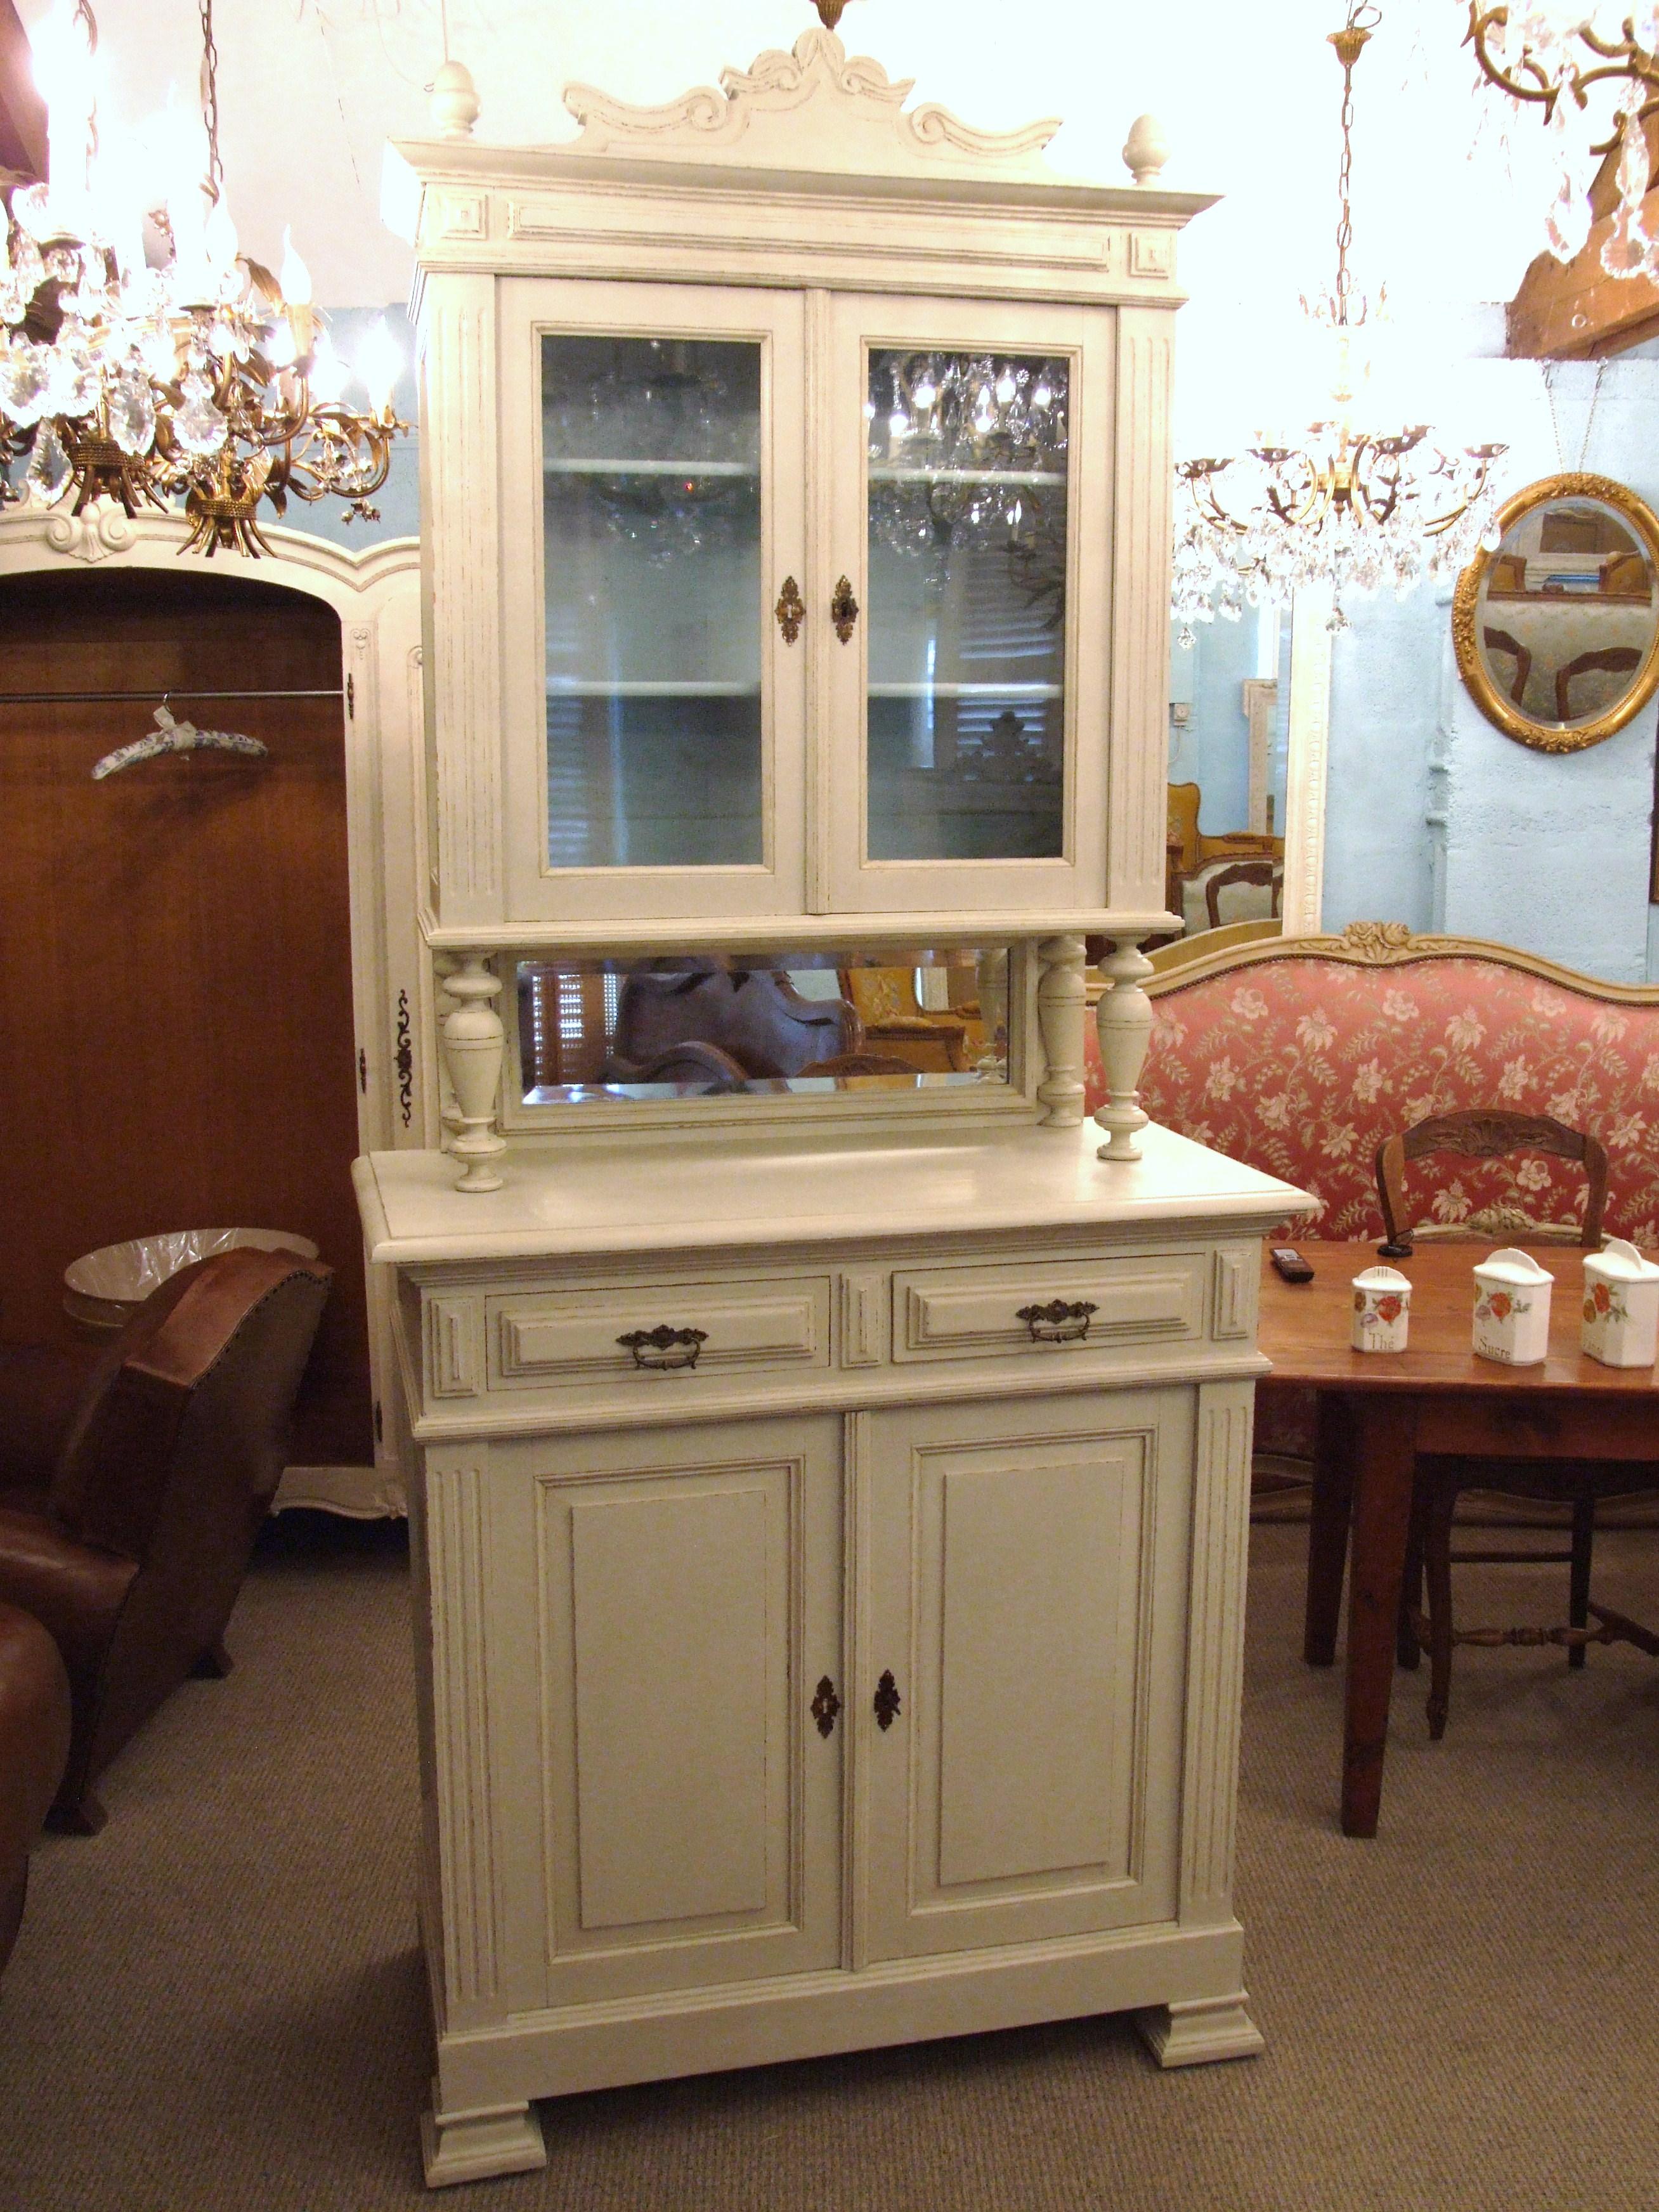 safe antique kitchen leadlight cupboard cabinet dresser meat